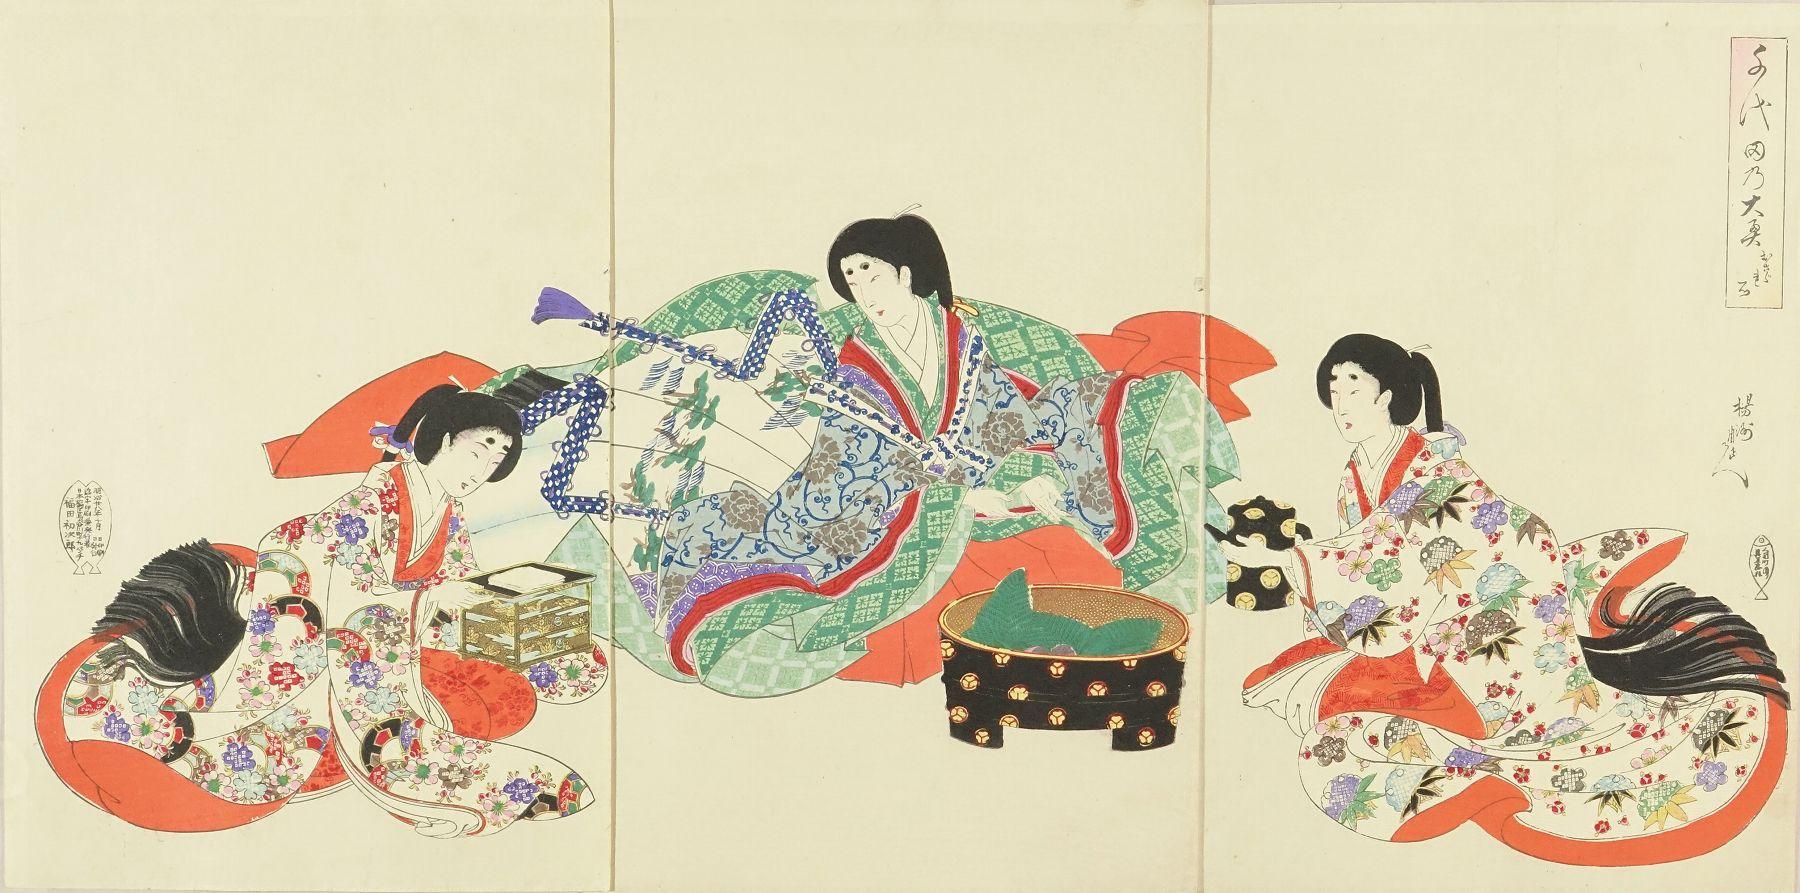 CHIKANOBU Ceremony of <i>Osazare ishi</i>, from <i>Chiyoda no o-oku</i> (Inner palace of Edo Castle), triptych